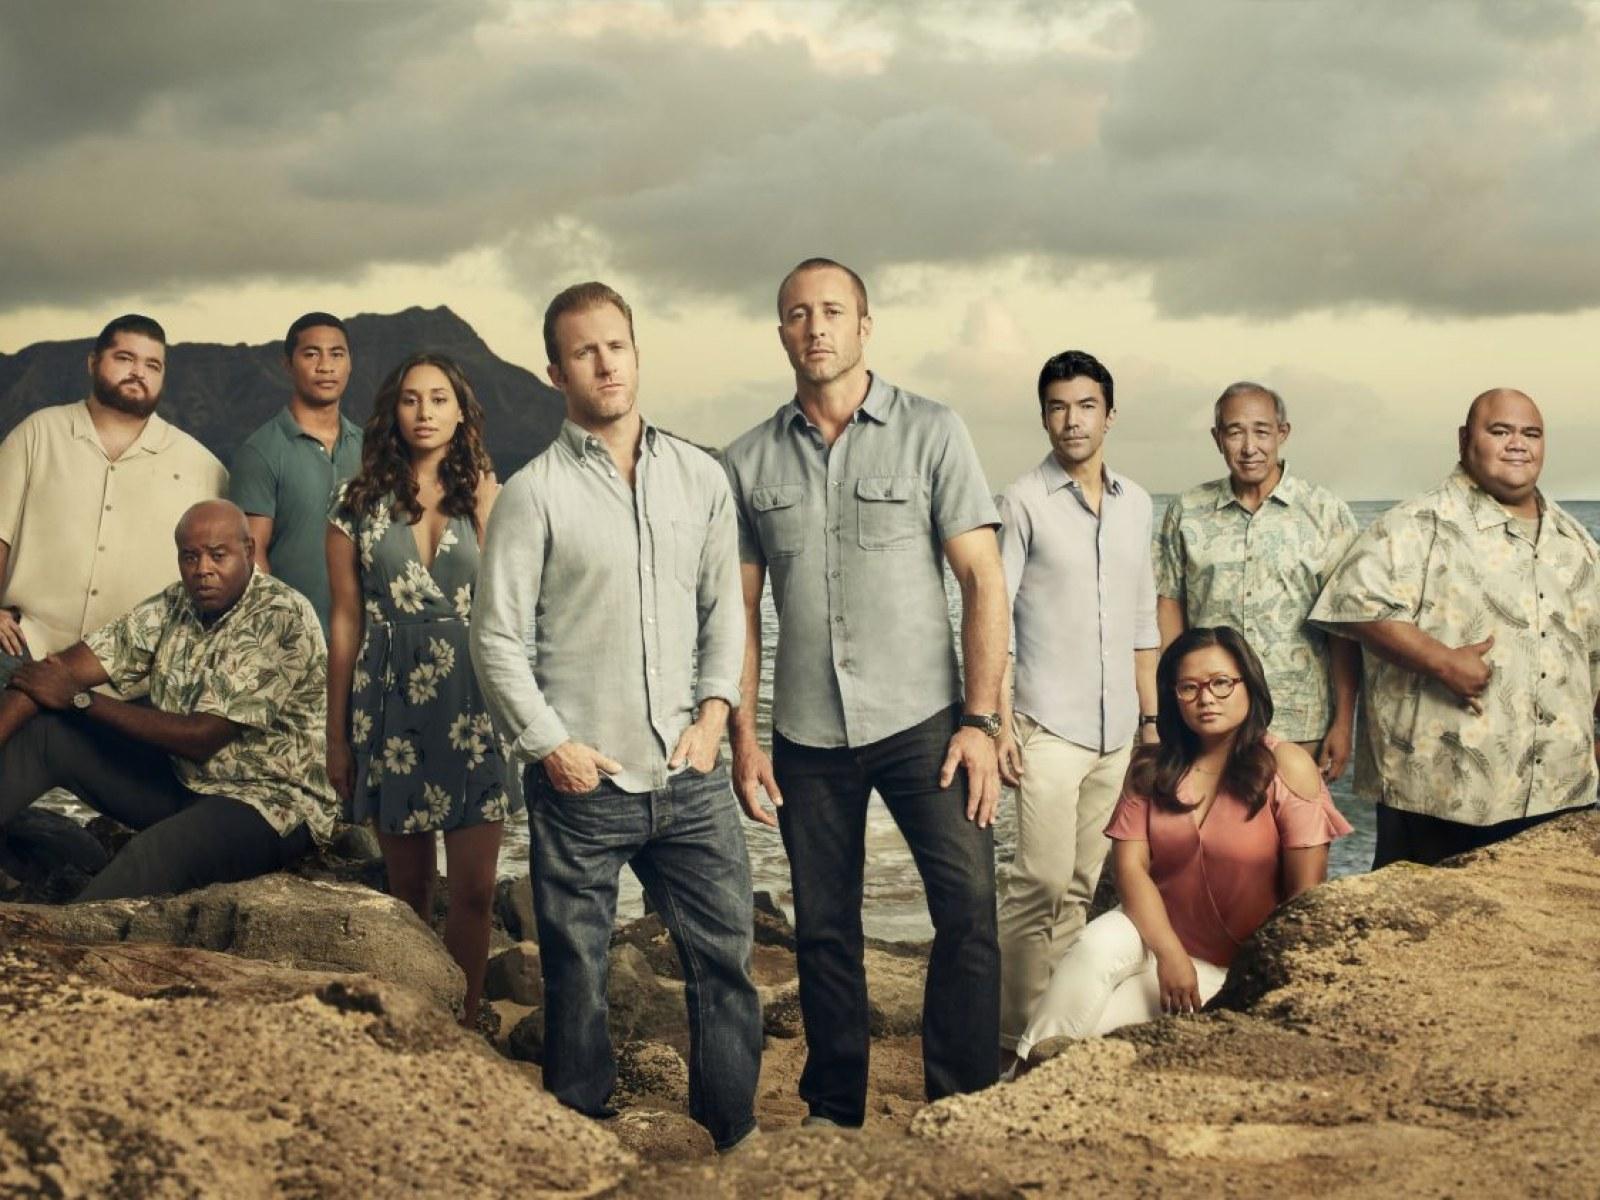 Hawaii Five-0' Season 9 Spoilers: McGarrett's Ex-Girlfriend